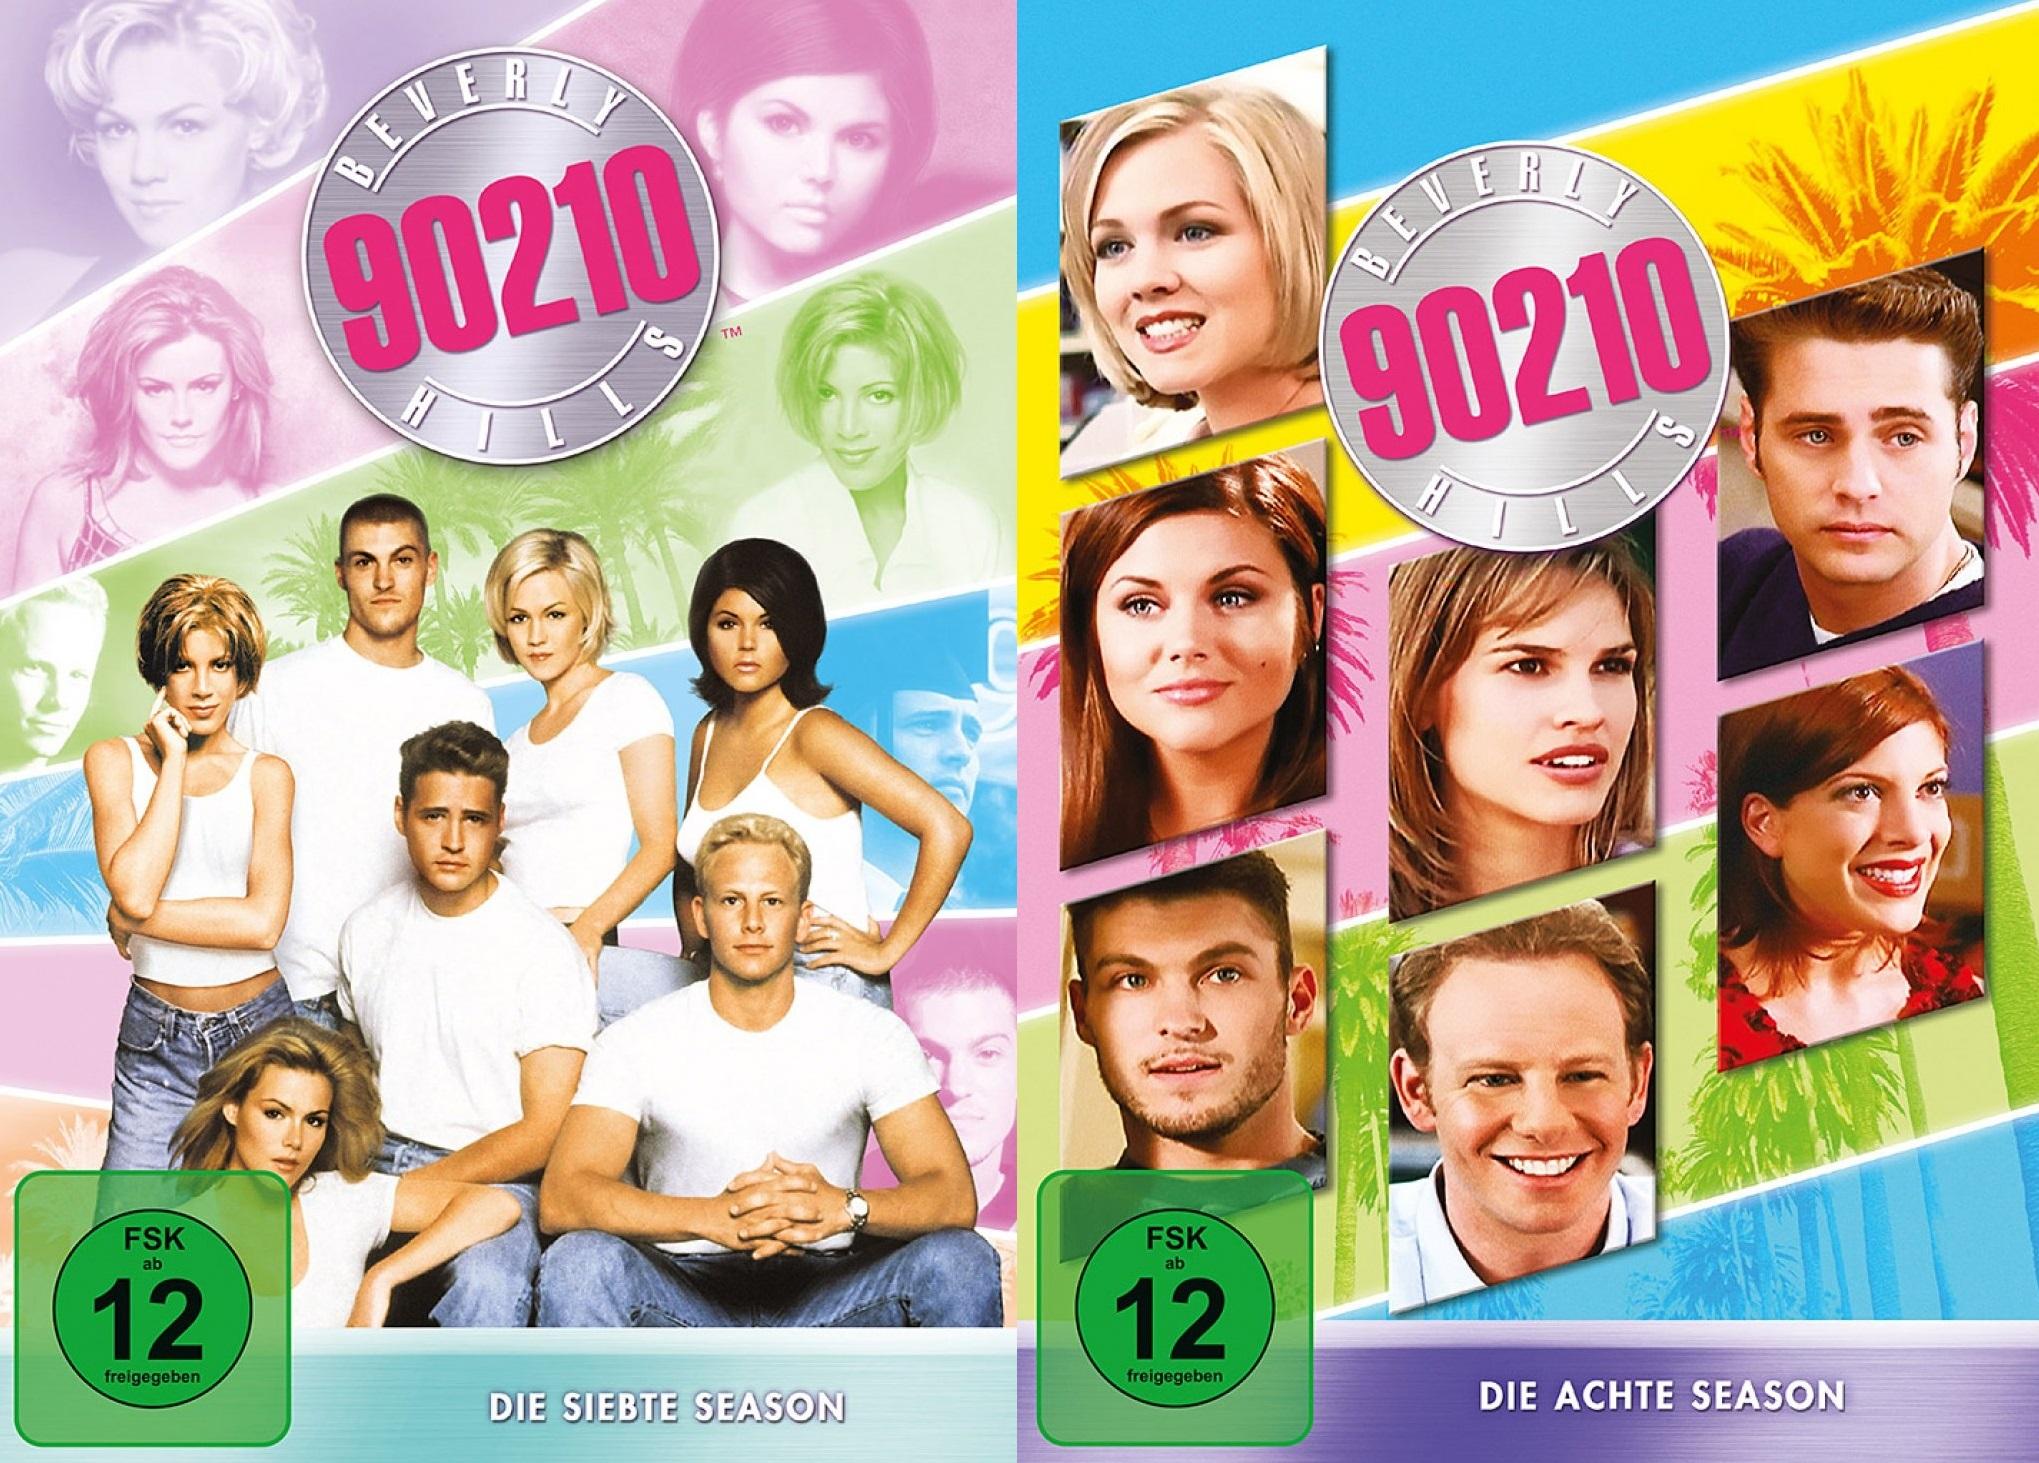 Beverly Hills 90210 Season Staffel 1 2 3 4 5 6 7 8 9 10 70 Dvd Set Neu Ebay